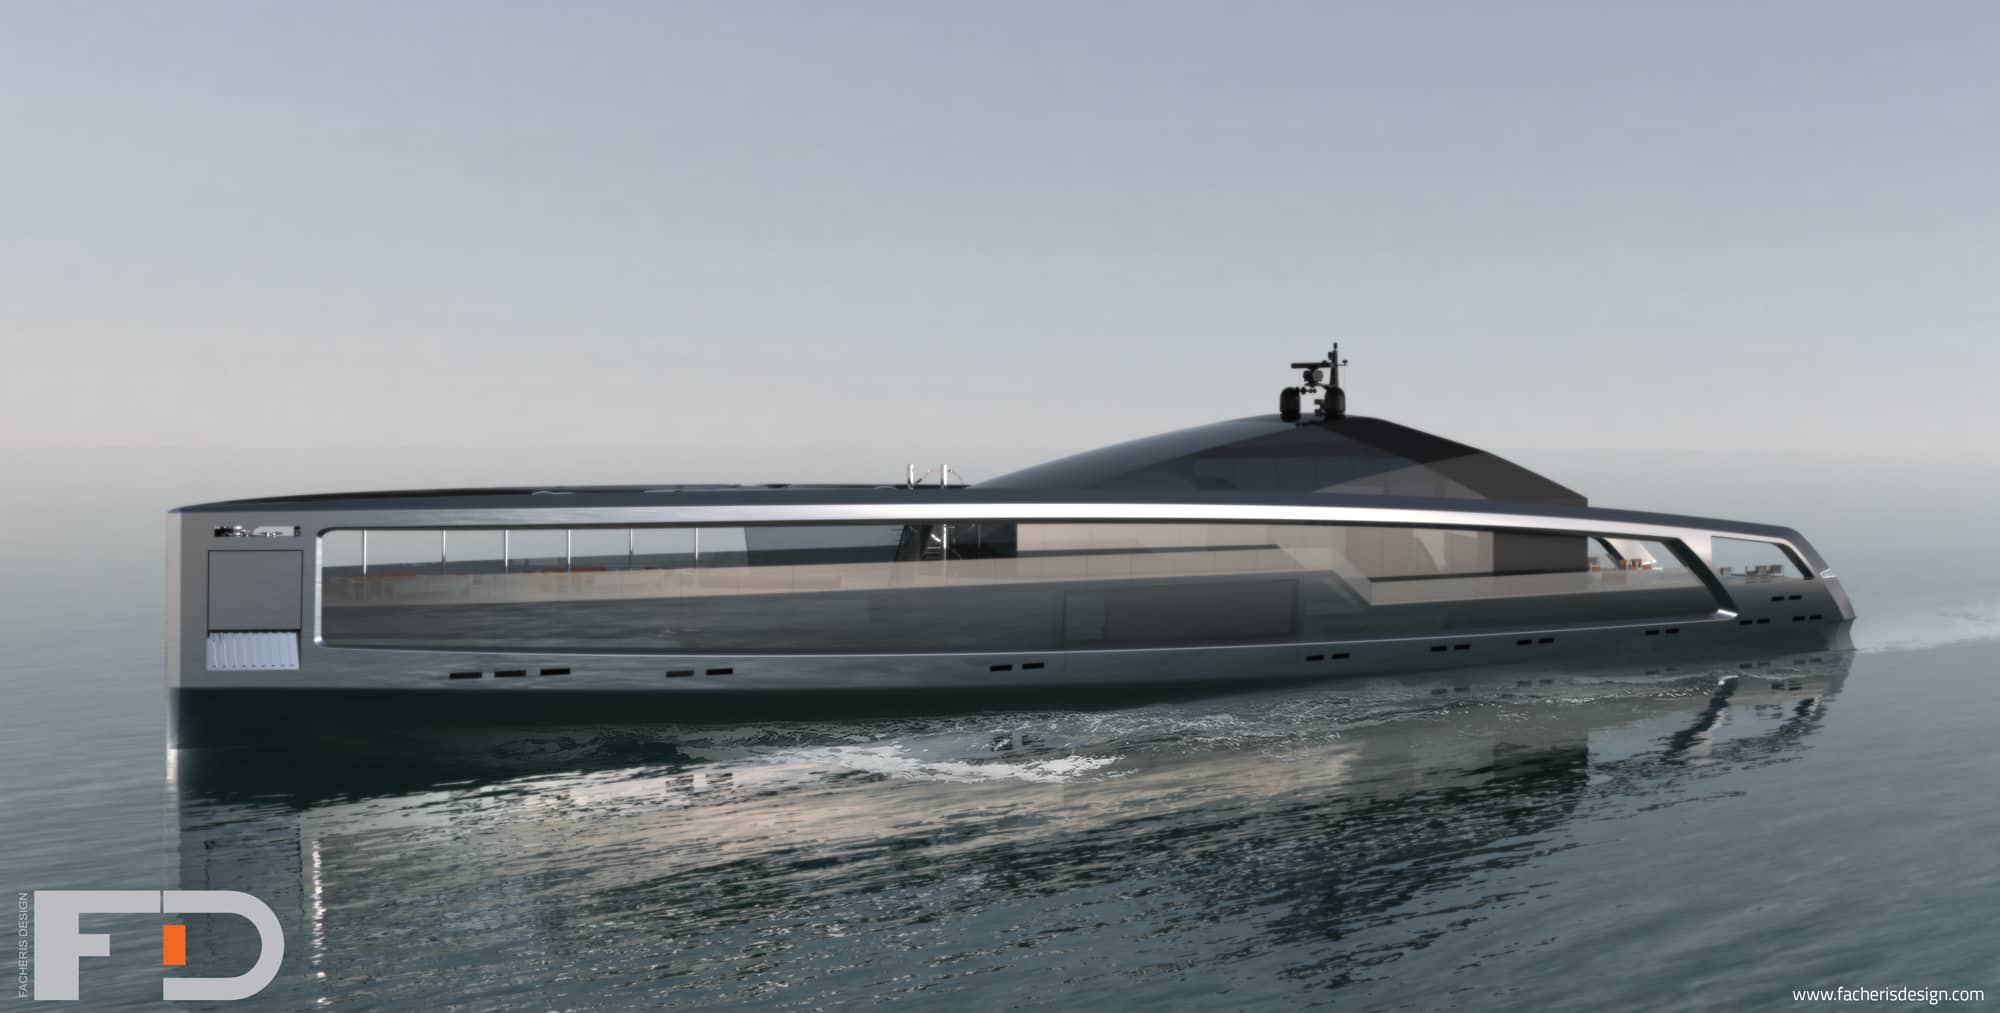 Maximus is a striking yacht concept from facheris design for Maxim design hotel 3 star